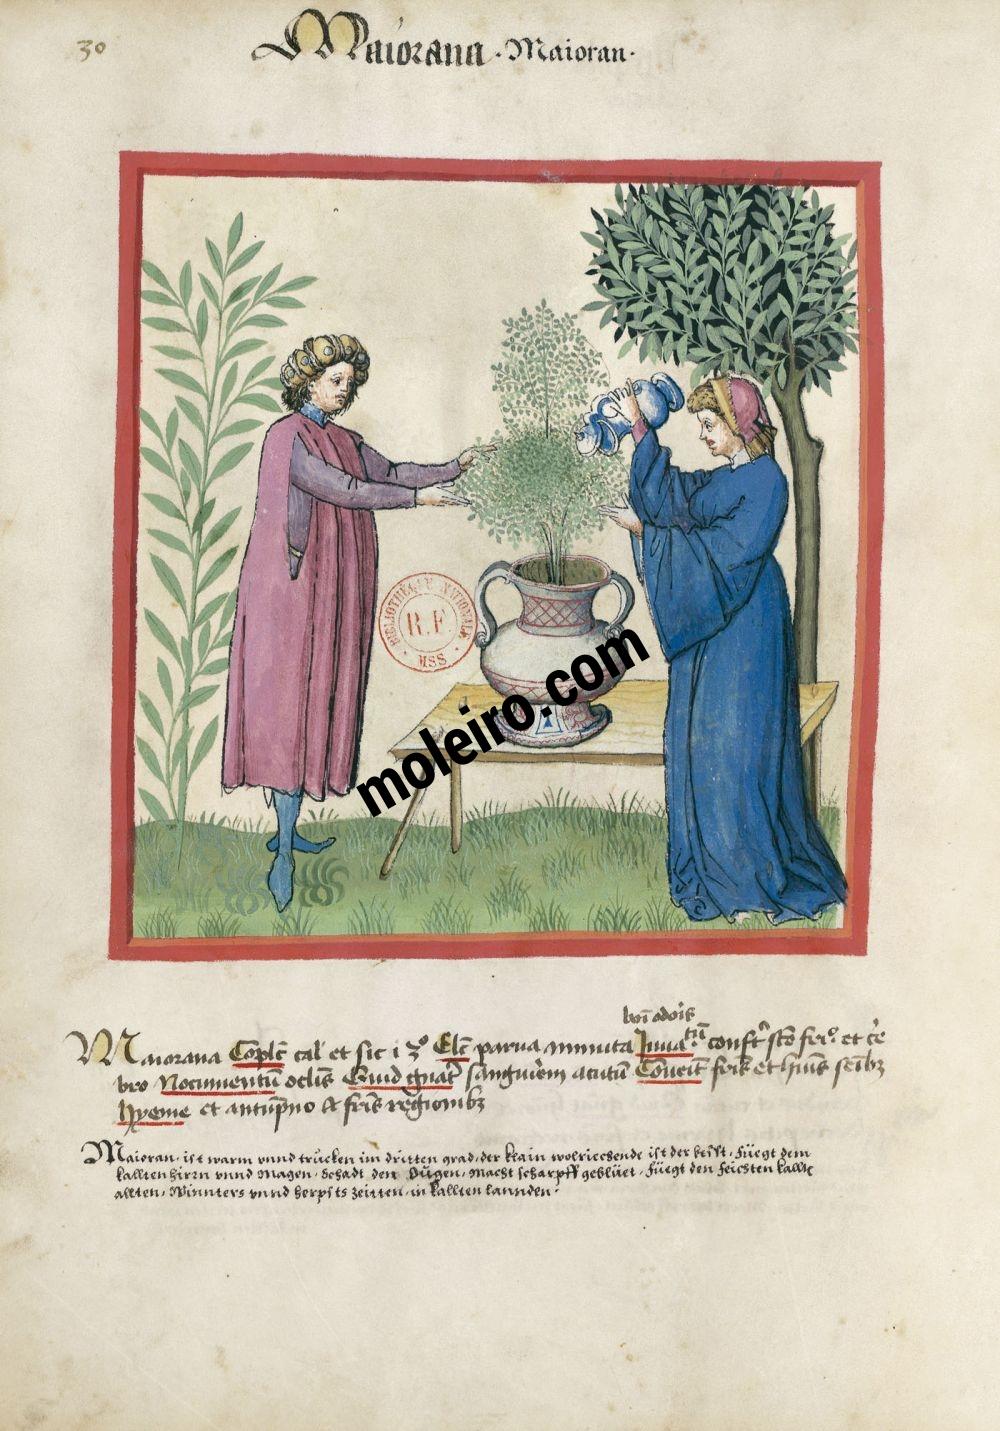 f. 30v, Mejorana en el Tacuinum Sanitatis - Ms. Lat 9333  (XV, Renania) Bibliothèque nationale de France, París tratado medicina edad media